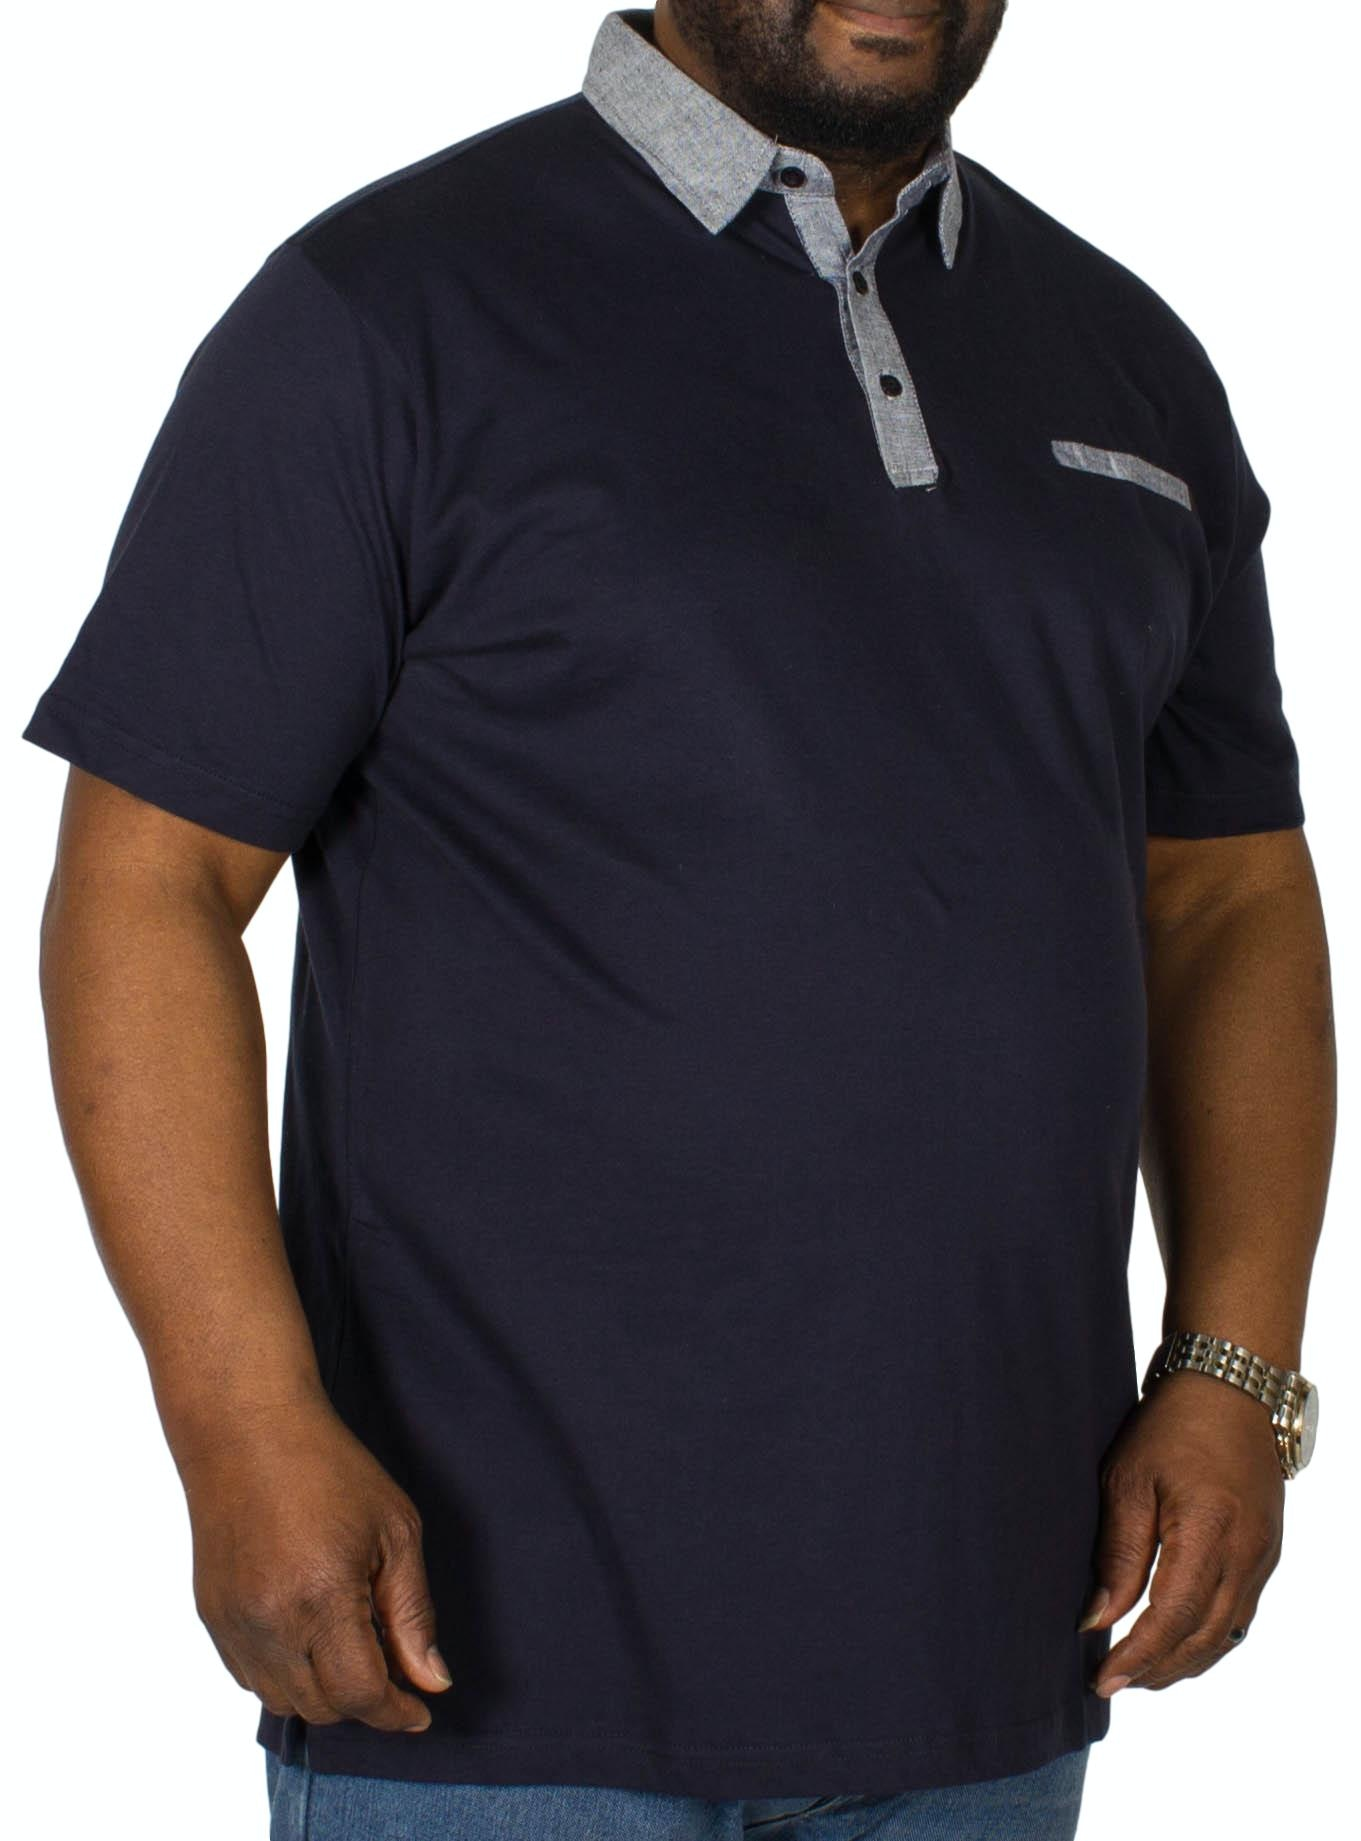 Bigdude Contrast Jersey Polo Shirt Navy Tall